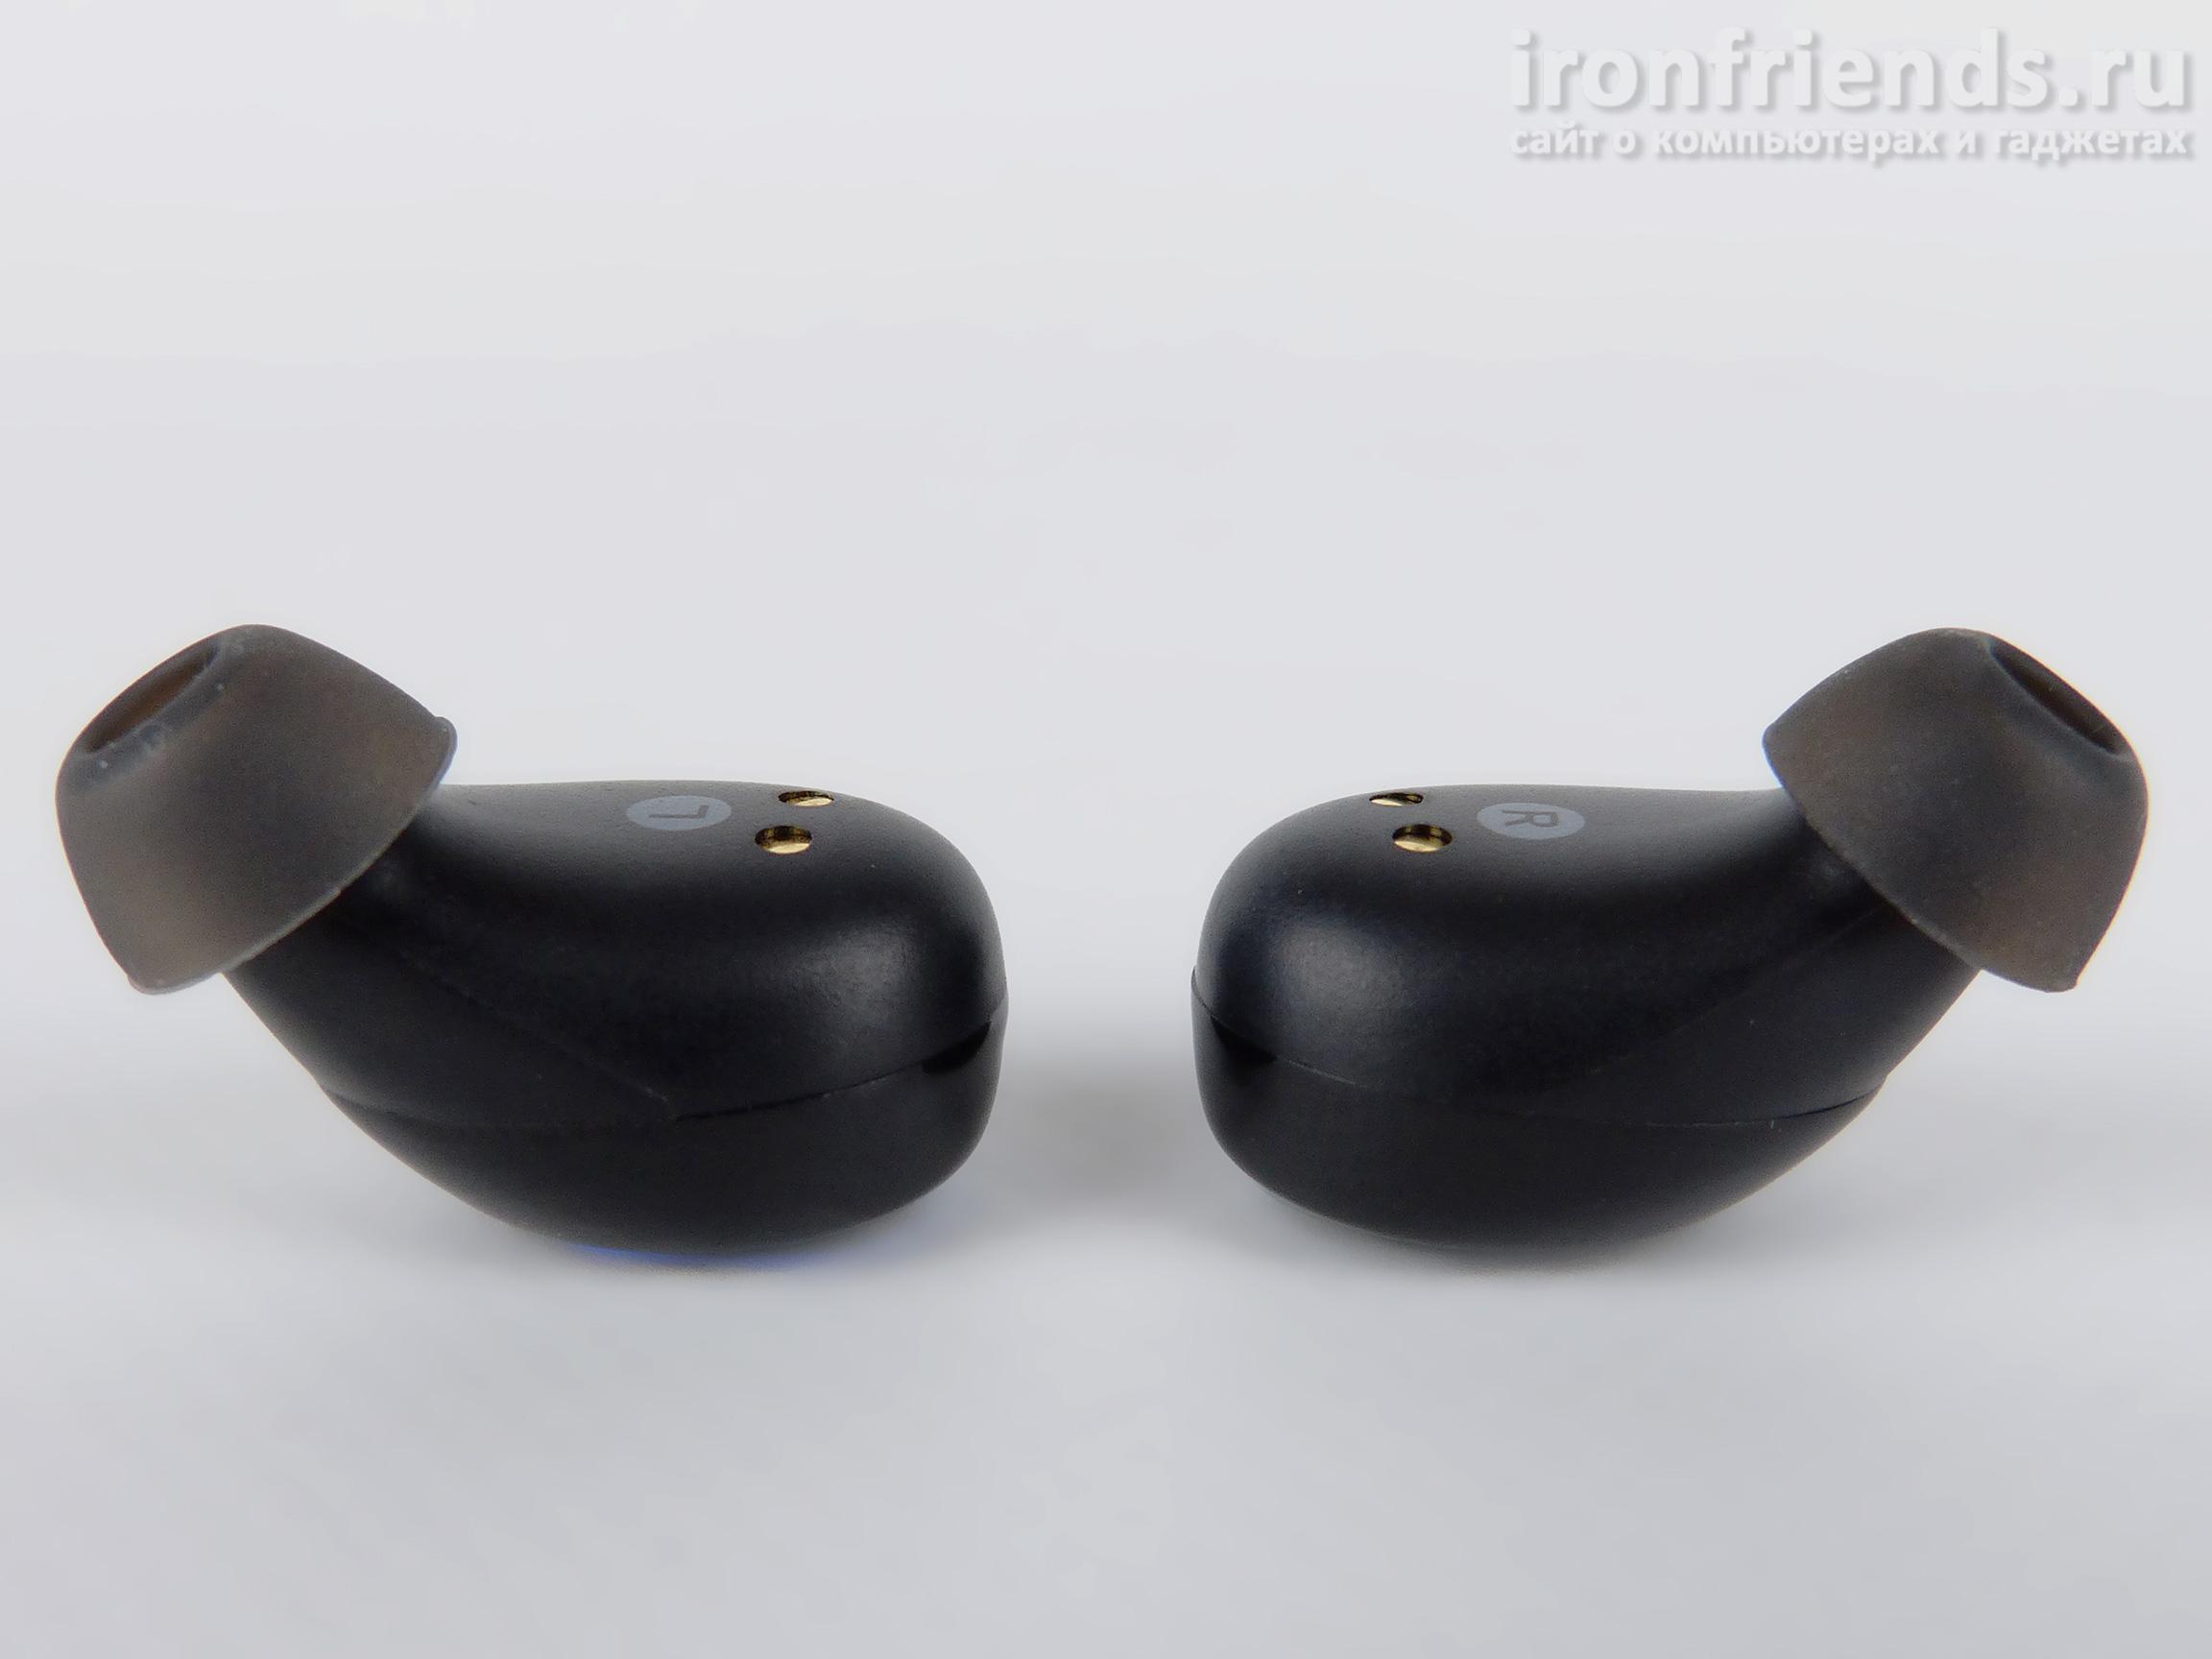 Наушники Tronsmart Onyx Neo